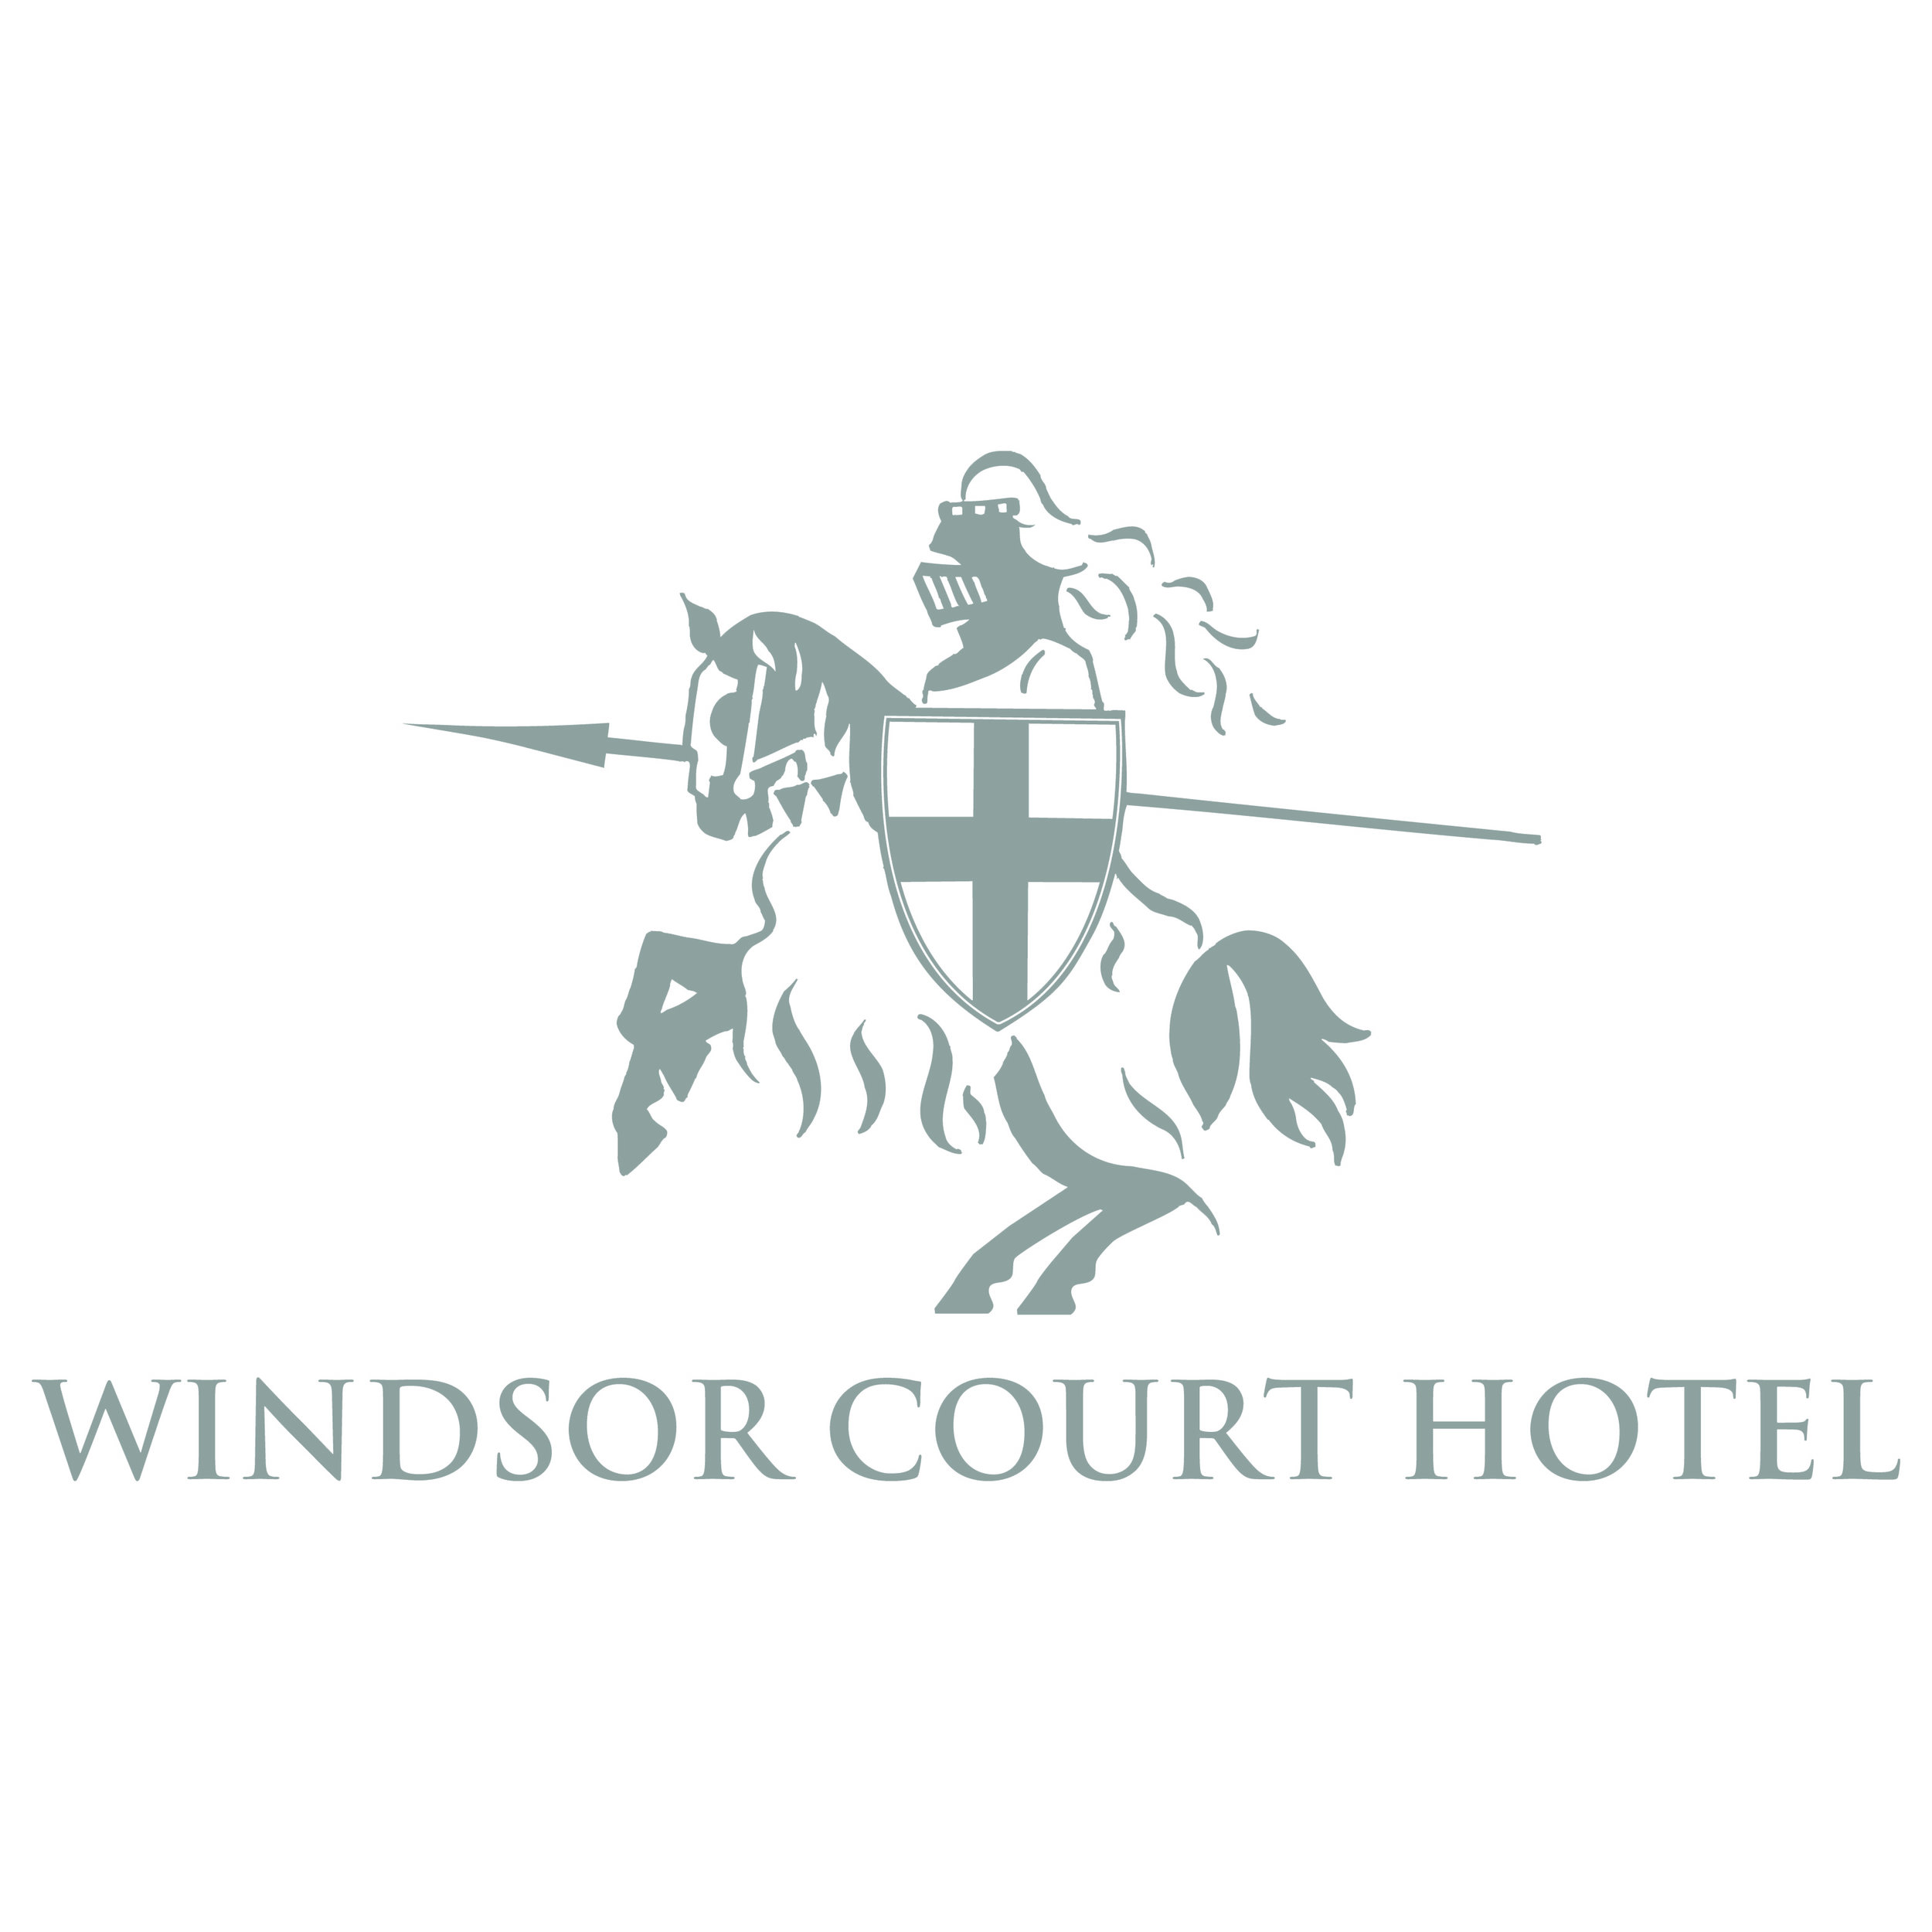 Windsor Court Hotel EDITED.jpg